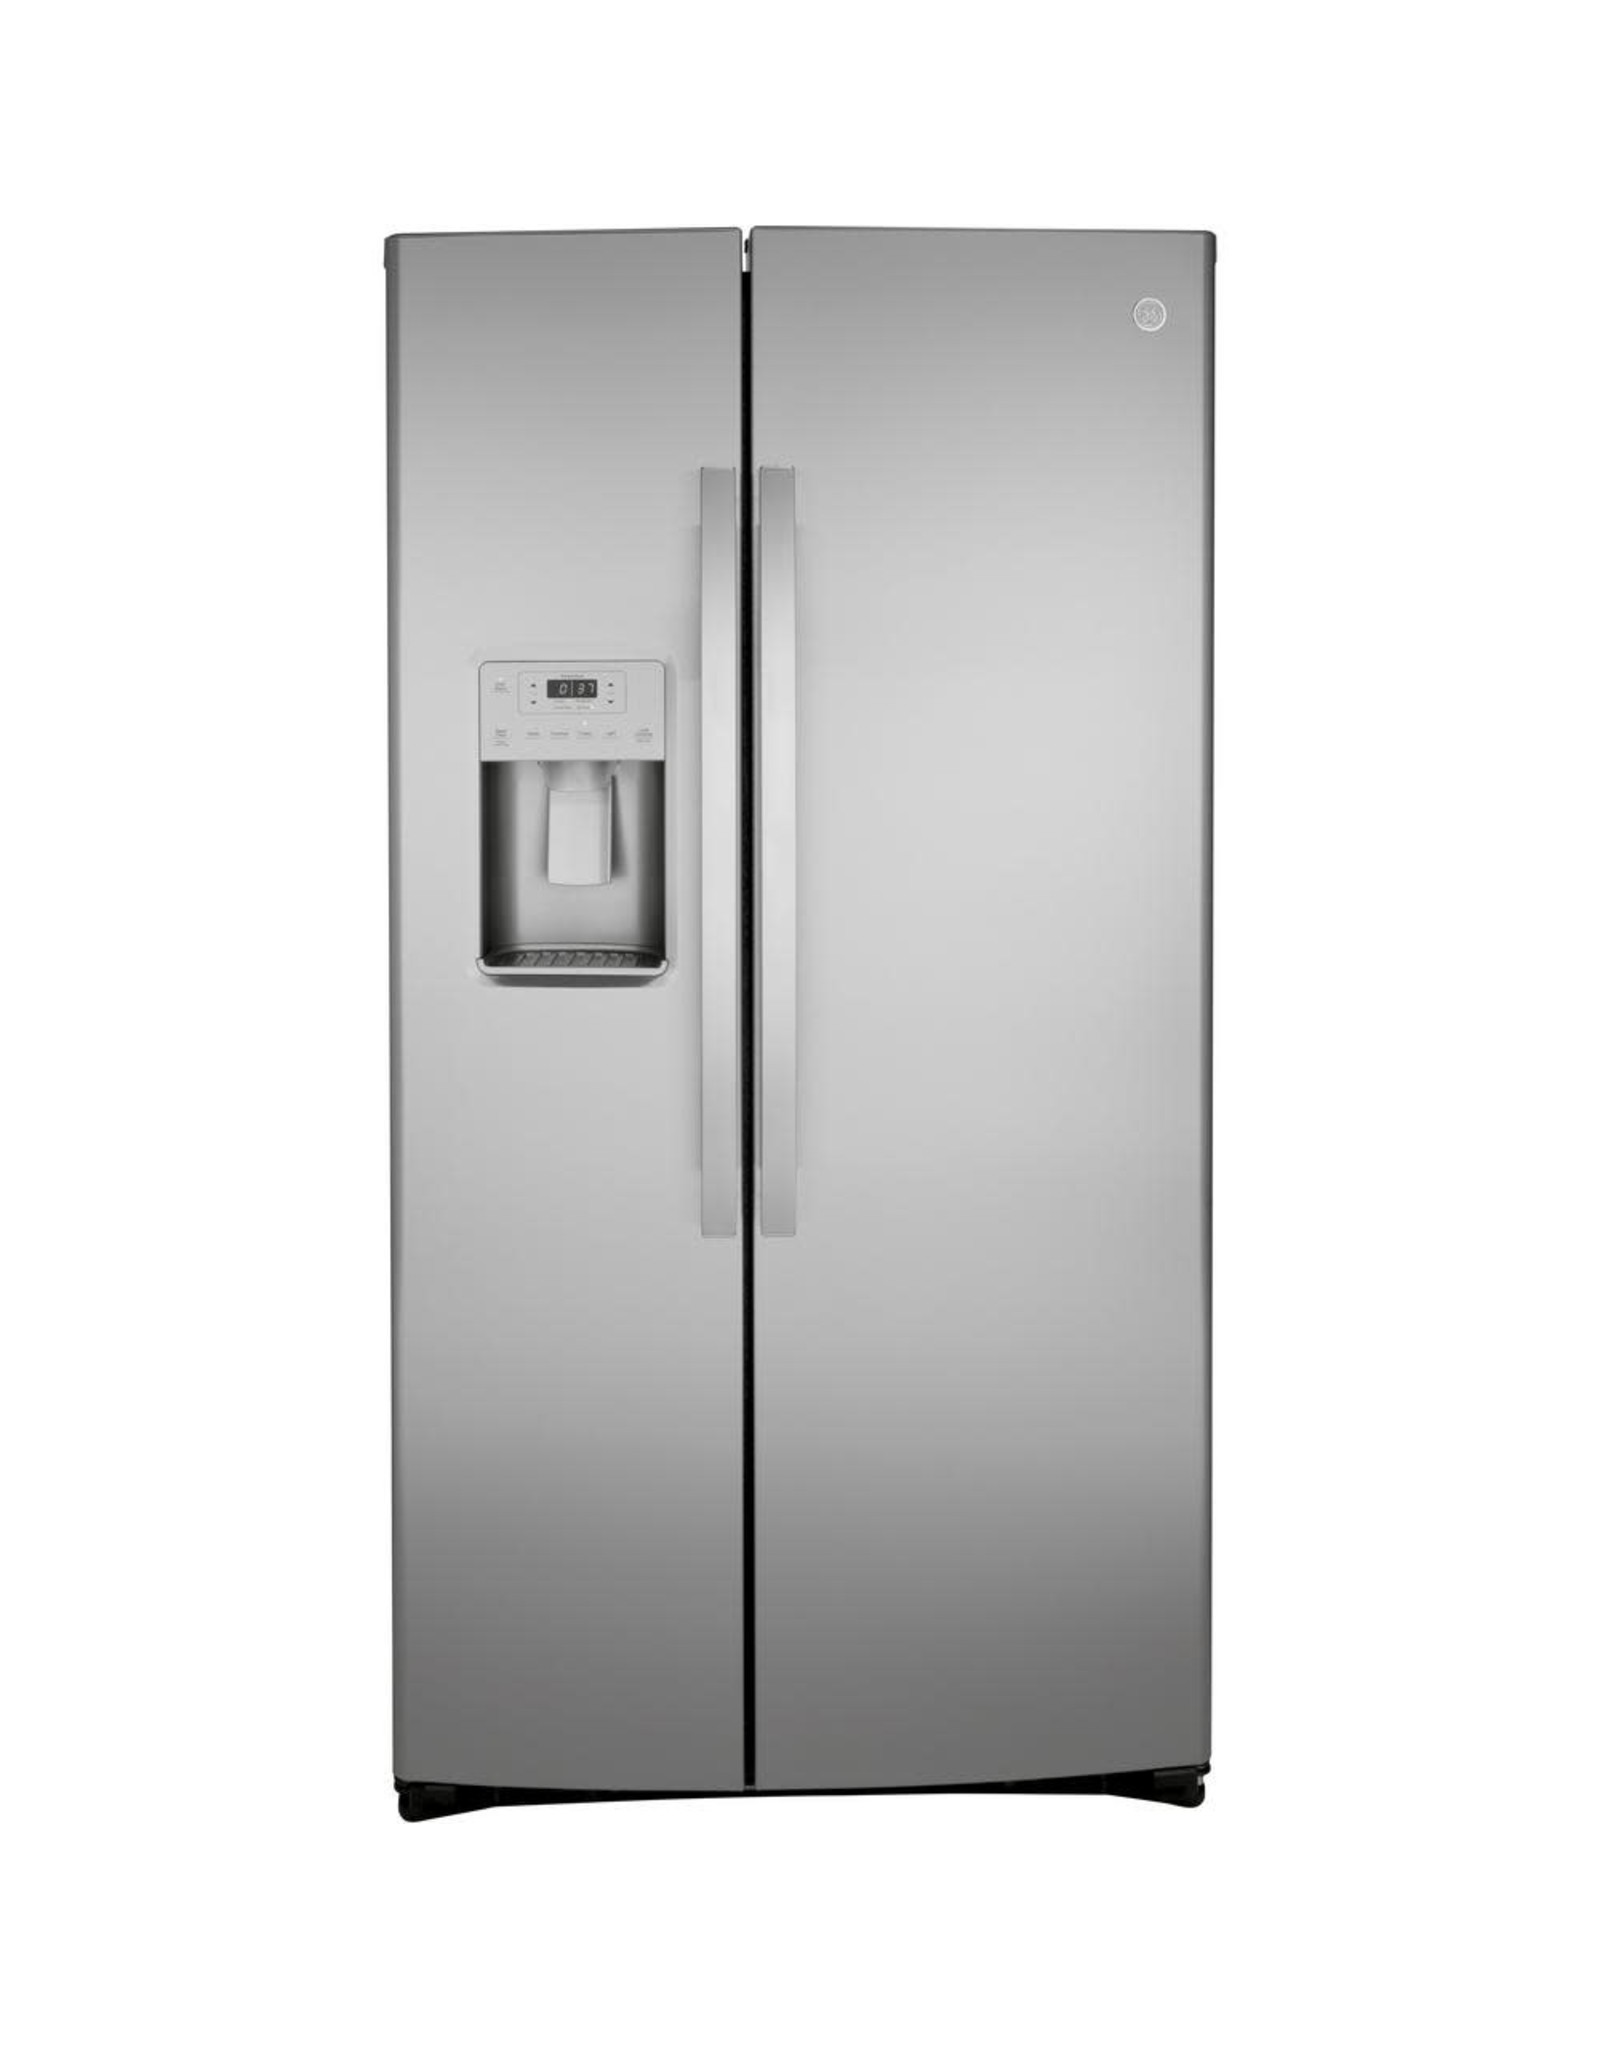 GE GSS25IYNFS 25.1 cu. ft. Side by Side Refrigerator in Fingerprint Resistant Stainless Steel